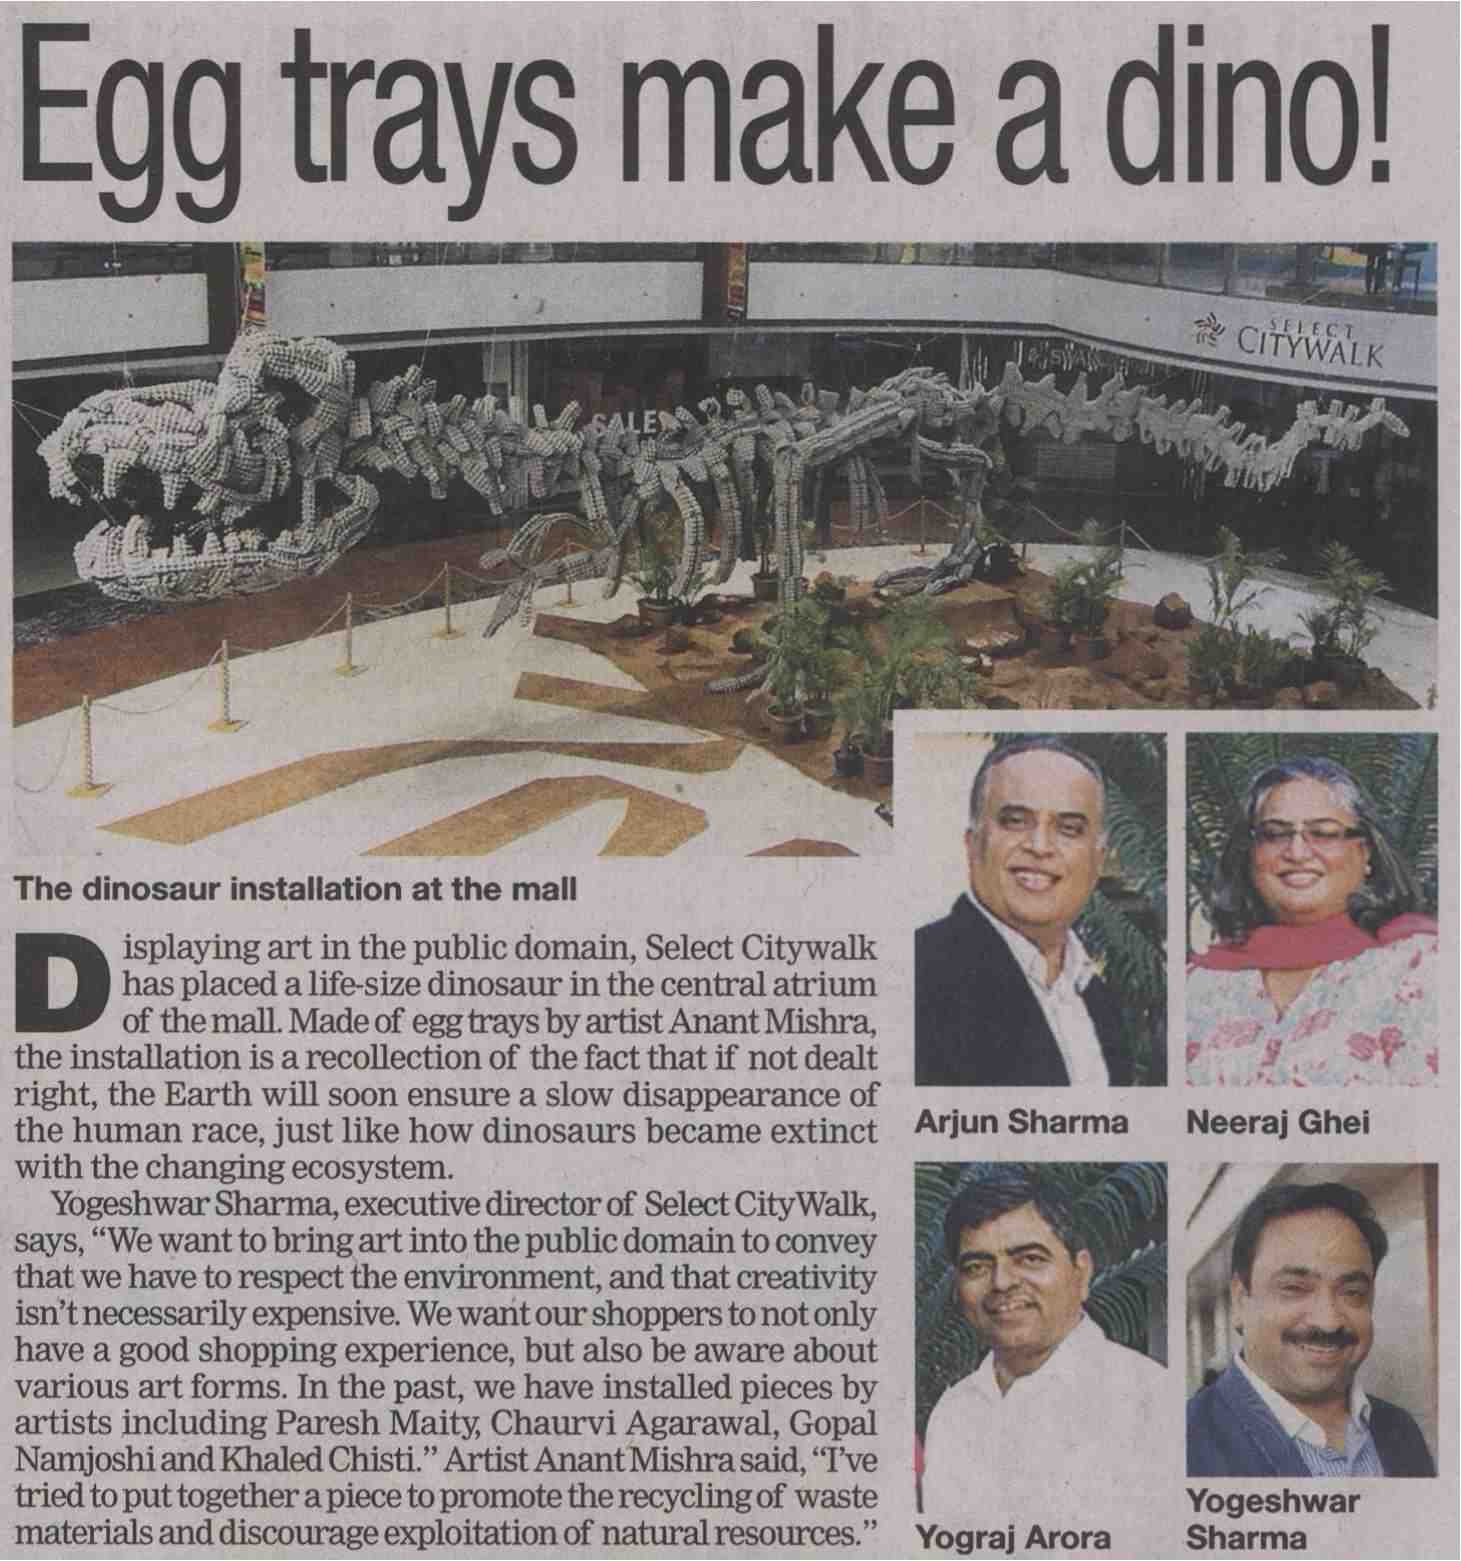 Egg trays make a dino !